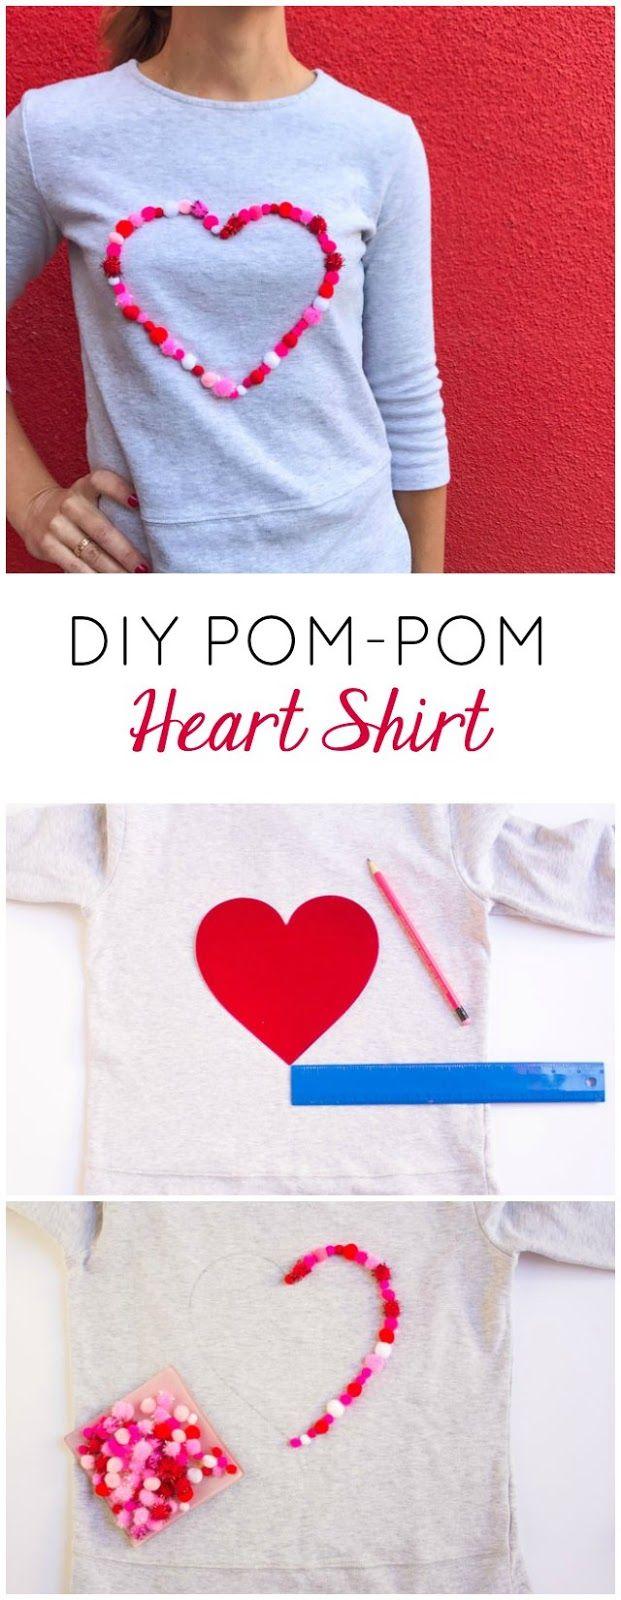 DIY Pom-Pom Heart Shirt | Design Improvised